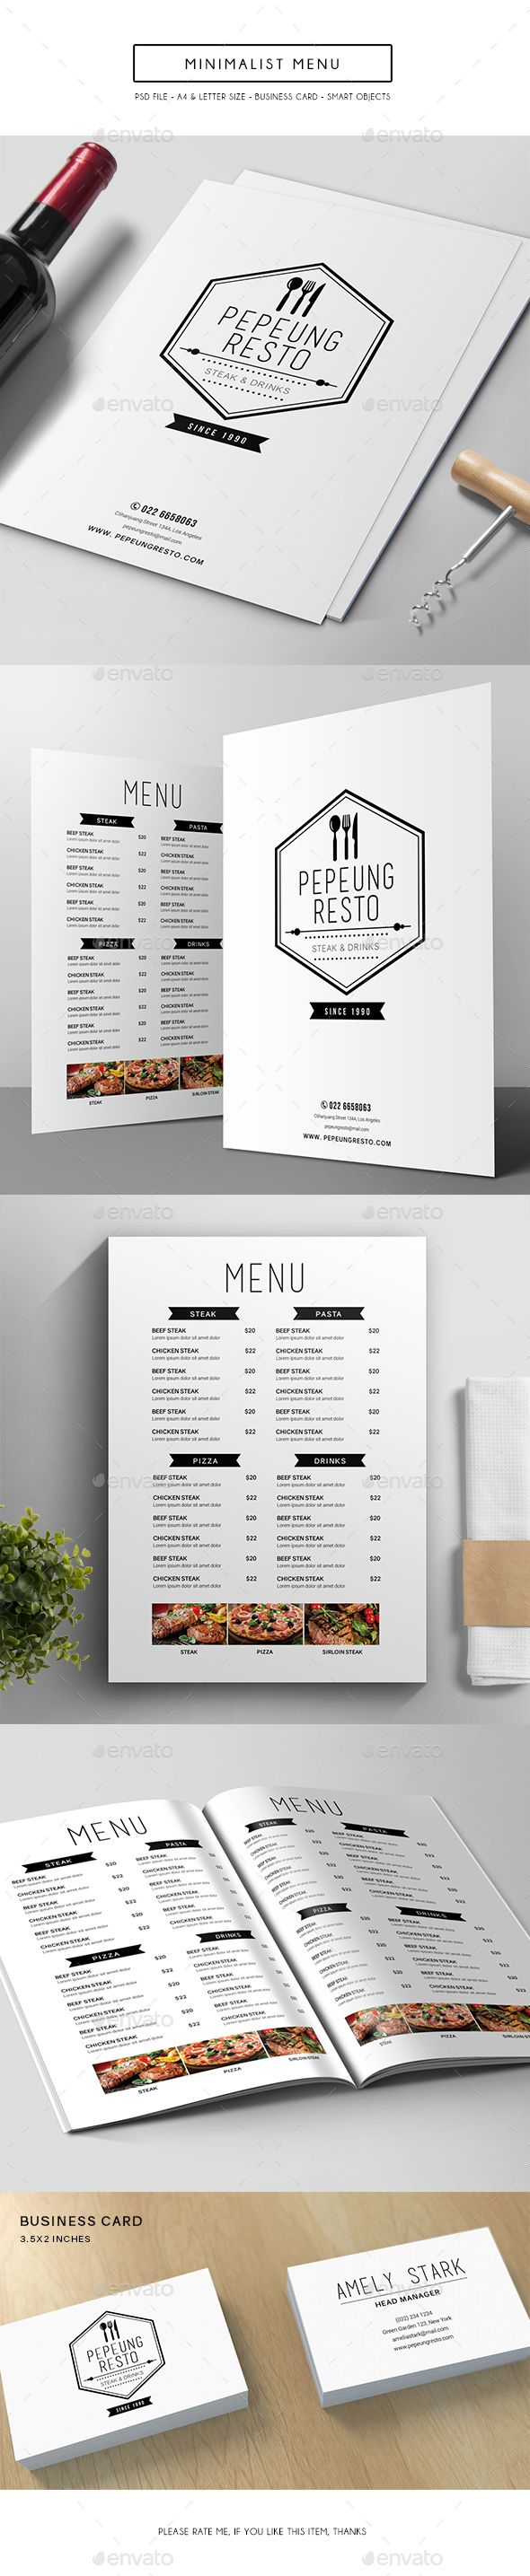 Minimalist Menu Template PSD #design Download: http://graphicriver.net/item/minimalist-menu/14276607?ref=ksioks